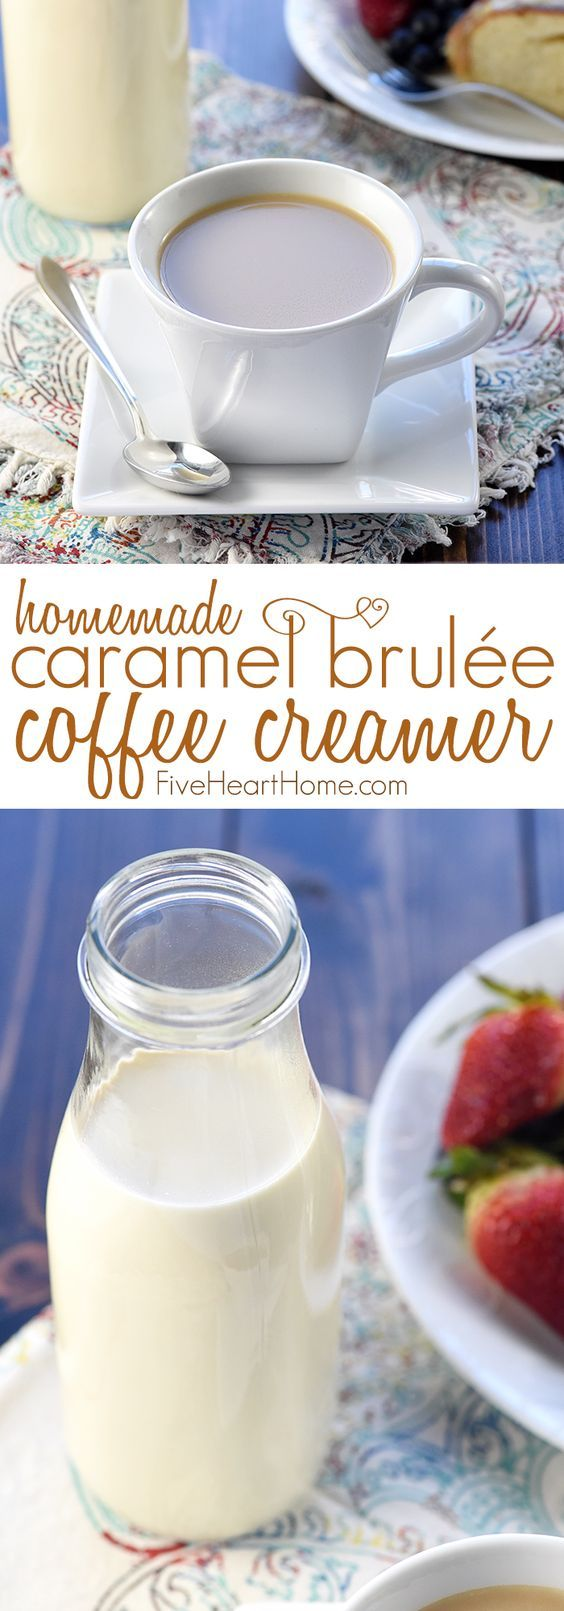 Caramel Brulée Coffee Creamer ~ a quick and easy homemade recipe for making Copycat Starbucks Caramel Brulée Lattes at home!   FiveHeartHome.com